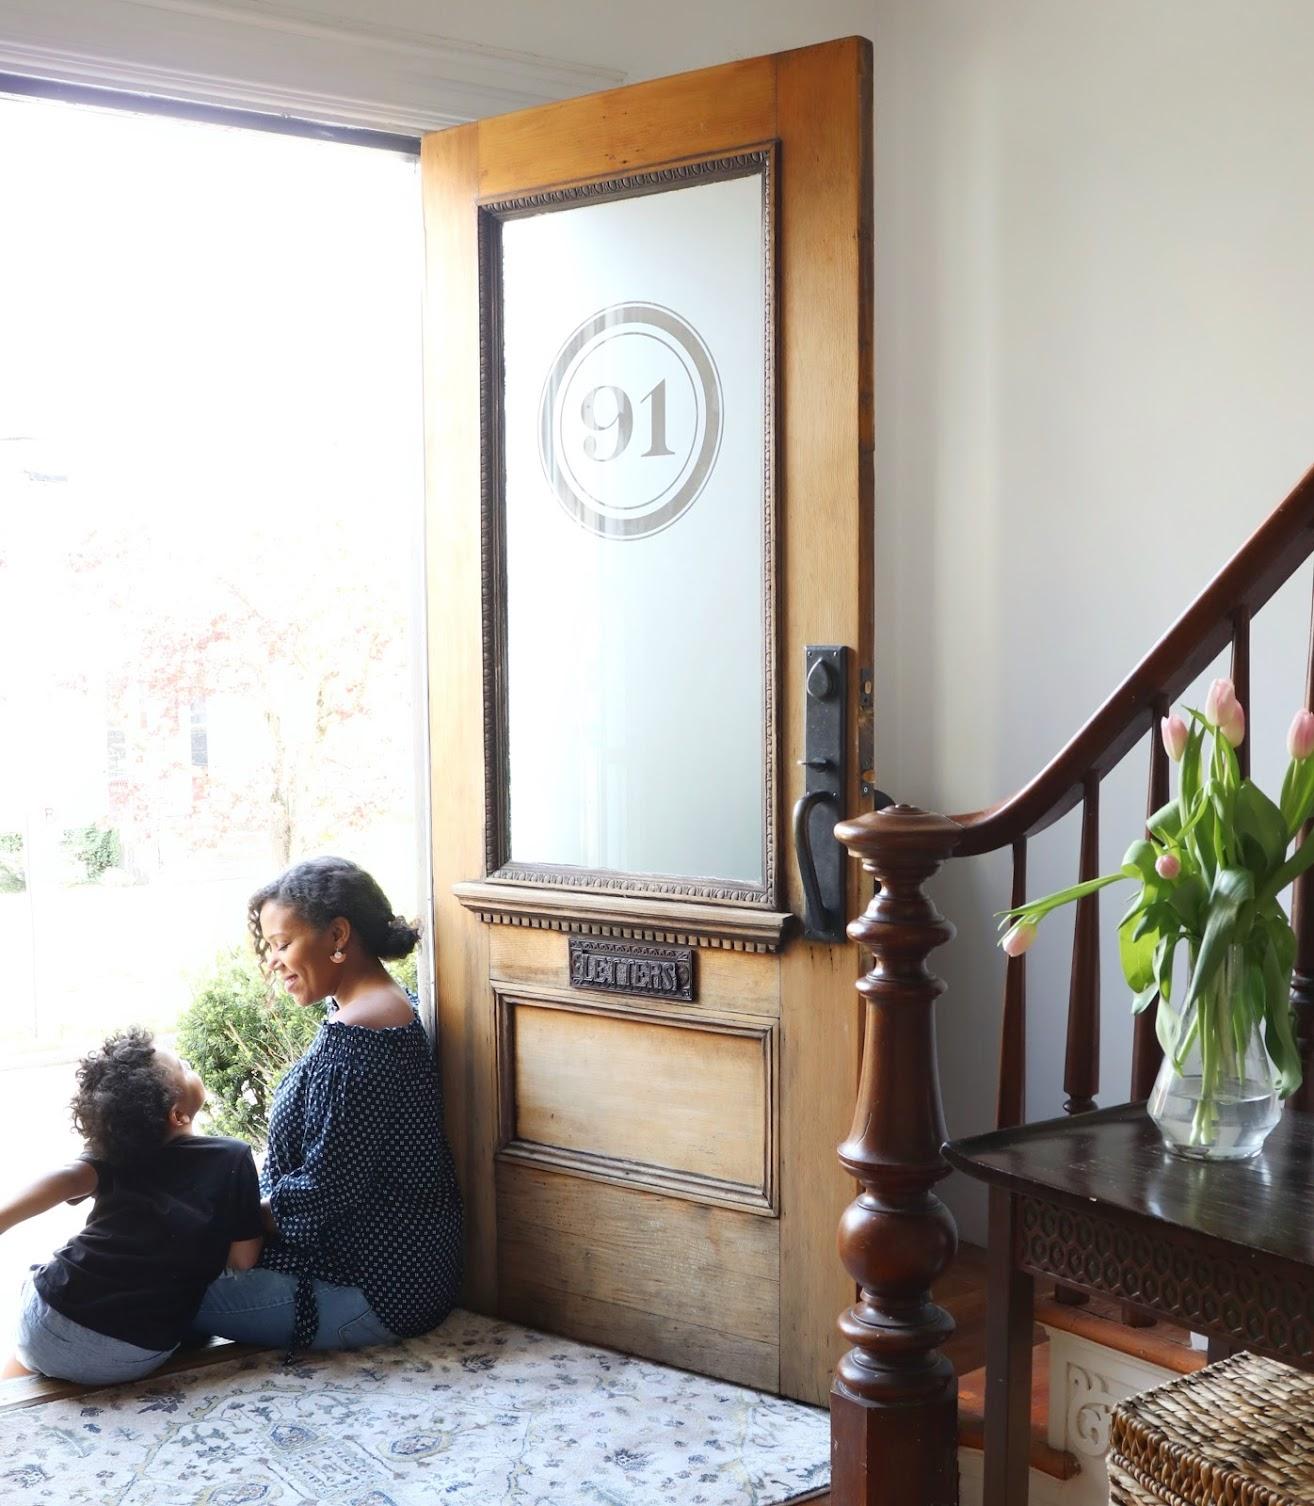 House Numbers For Front Door Easy